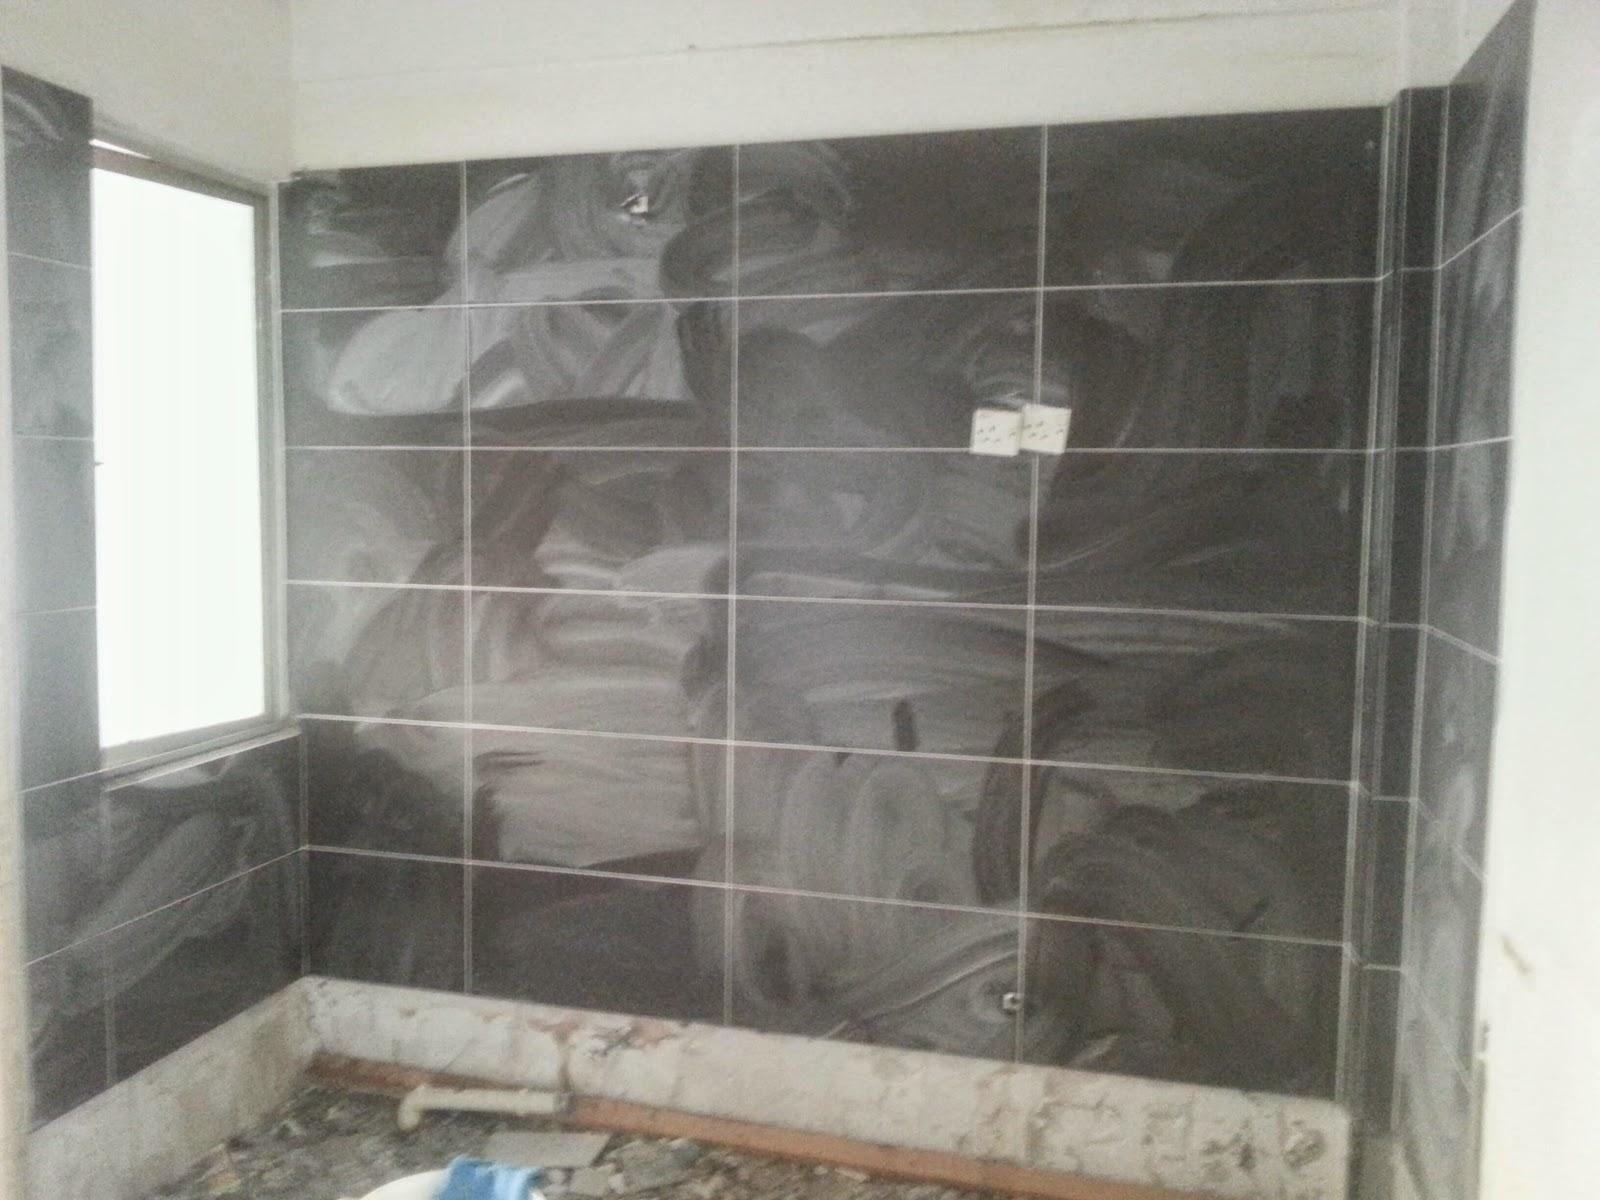 pasang tile dinding dapur 1 2sq warna hitam